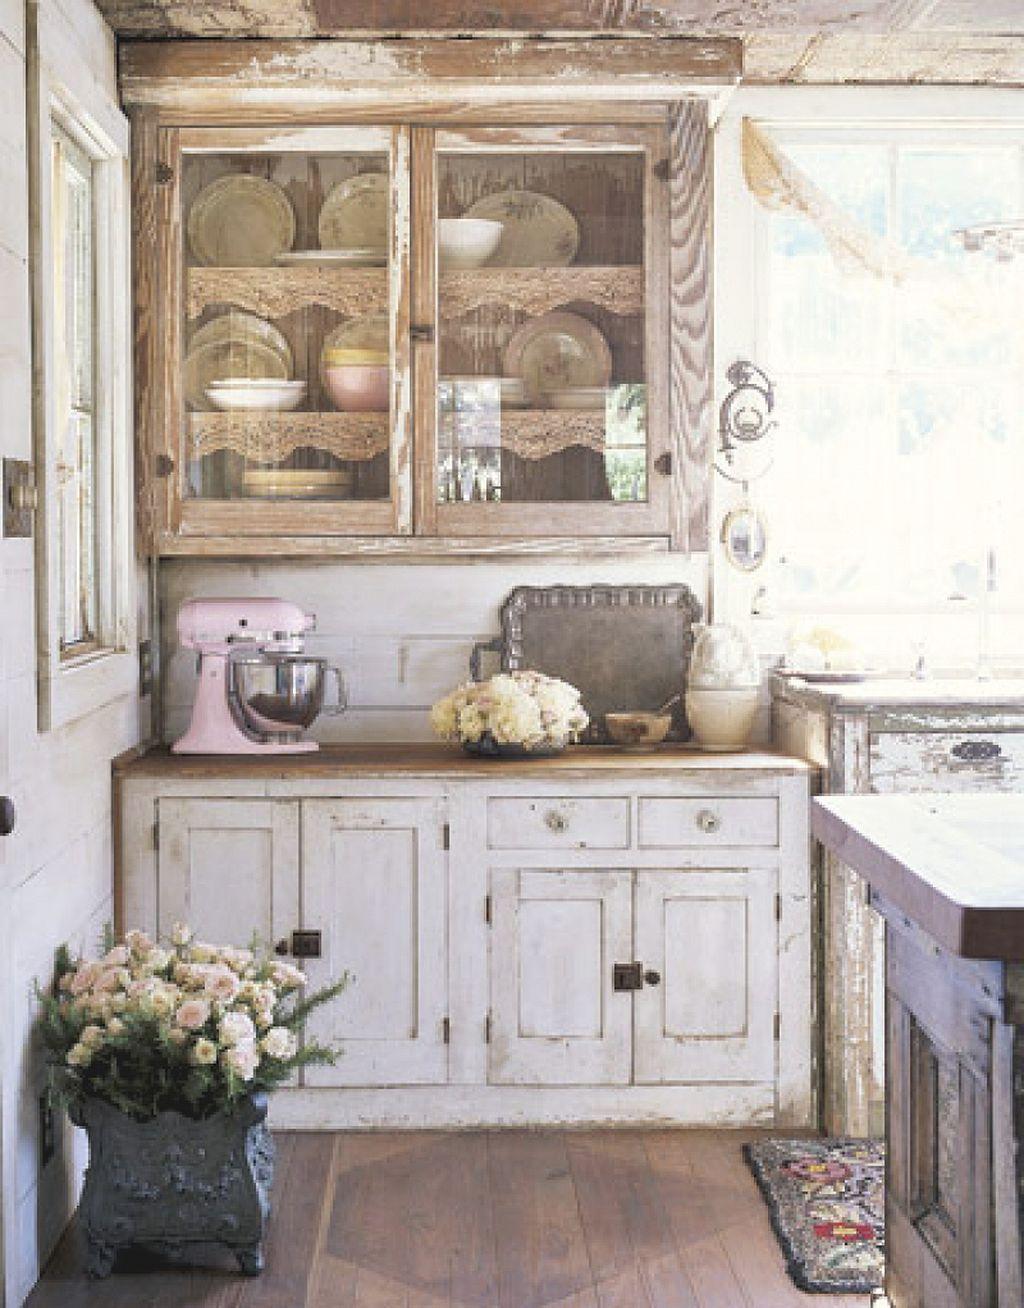 40 Shabby Chic Kitchen Decor Ideas 6